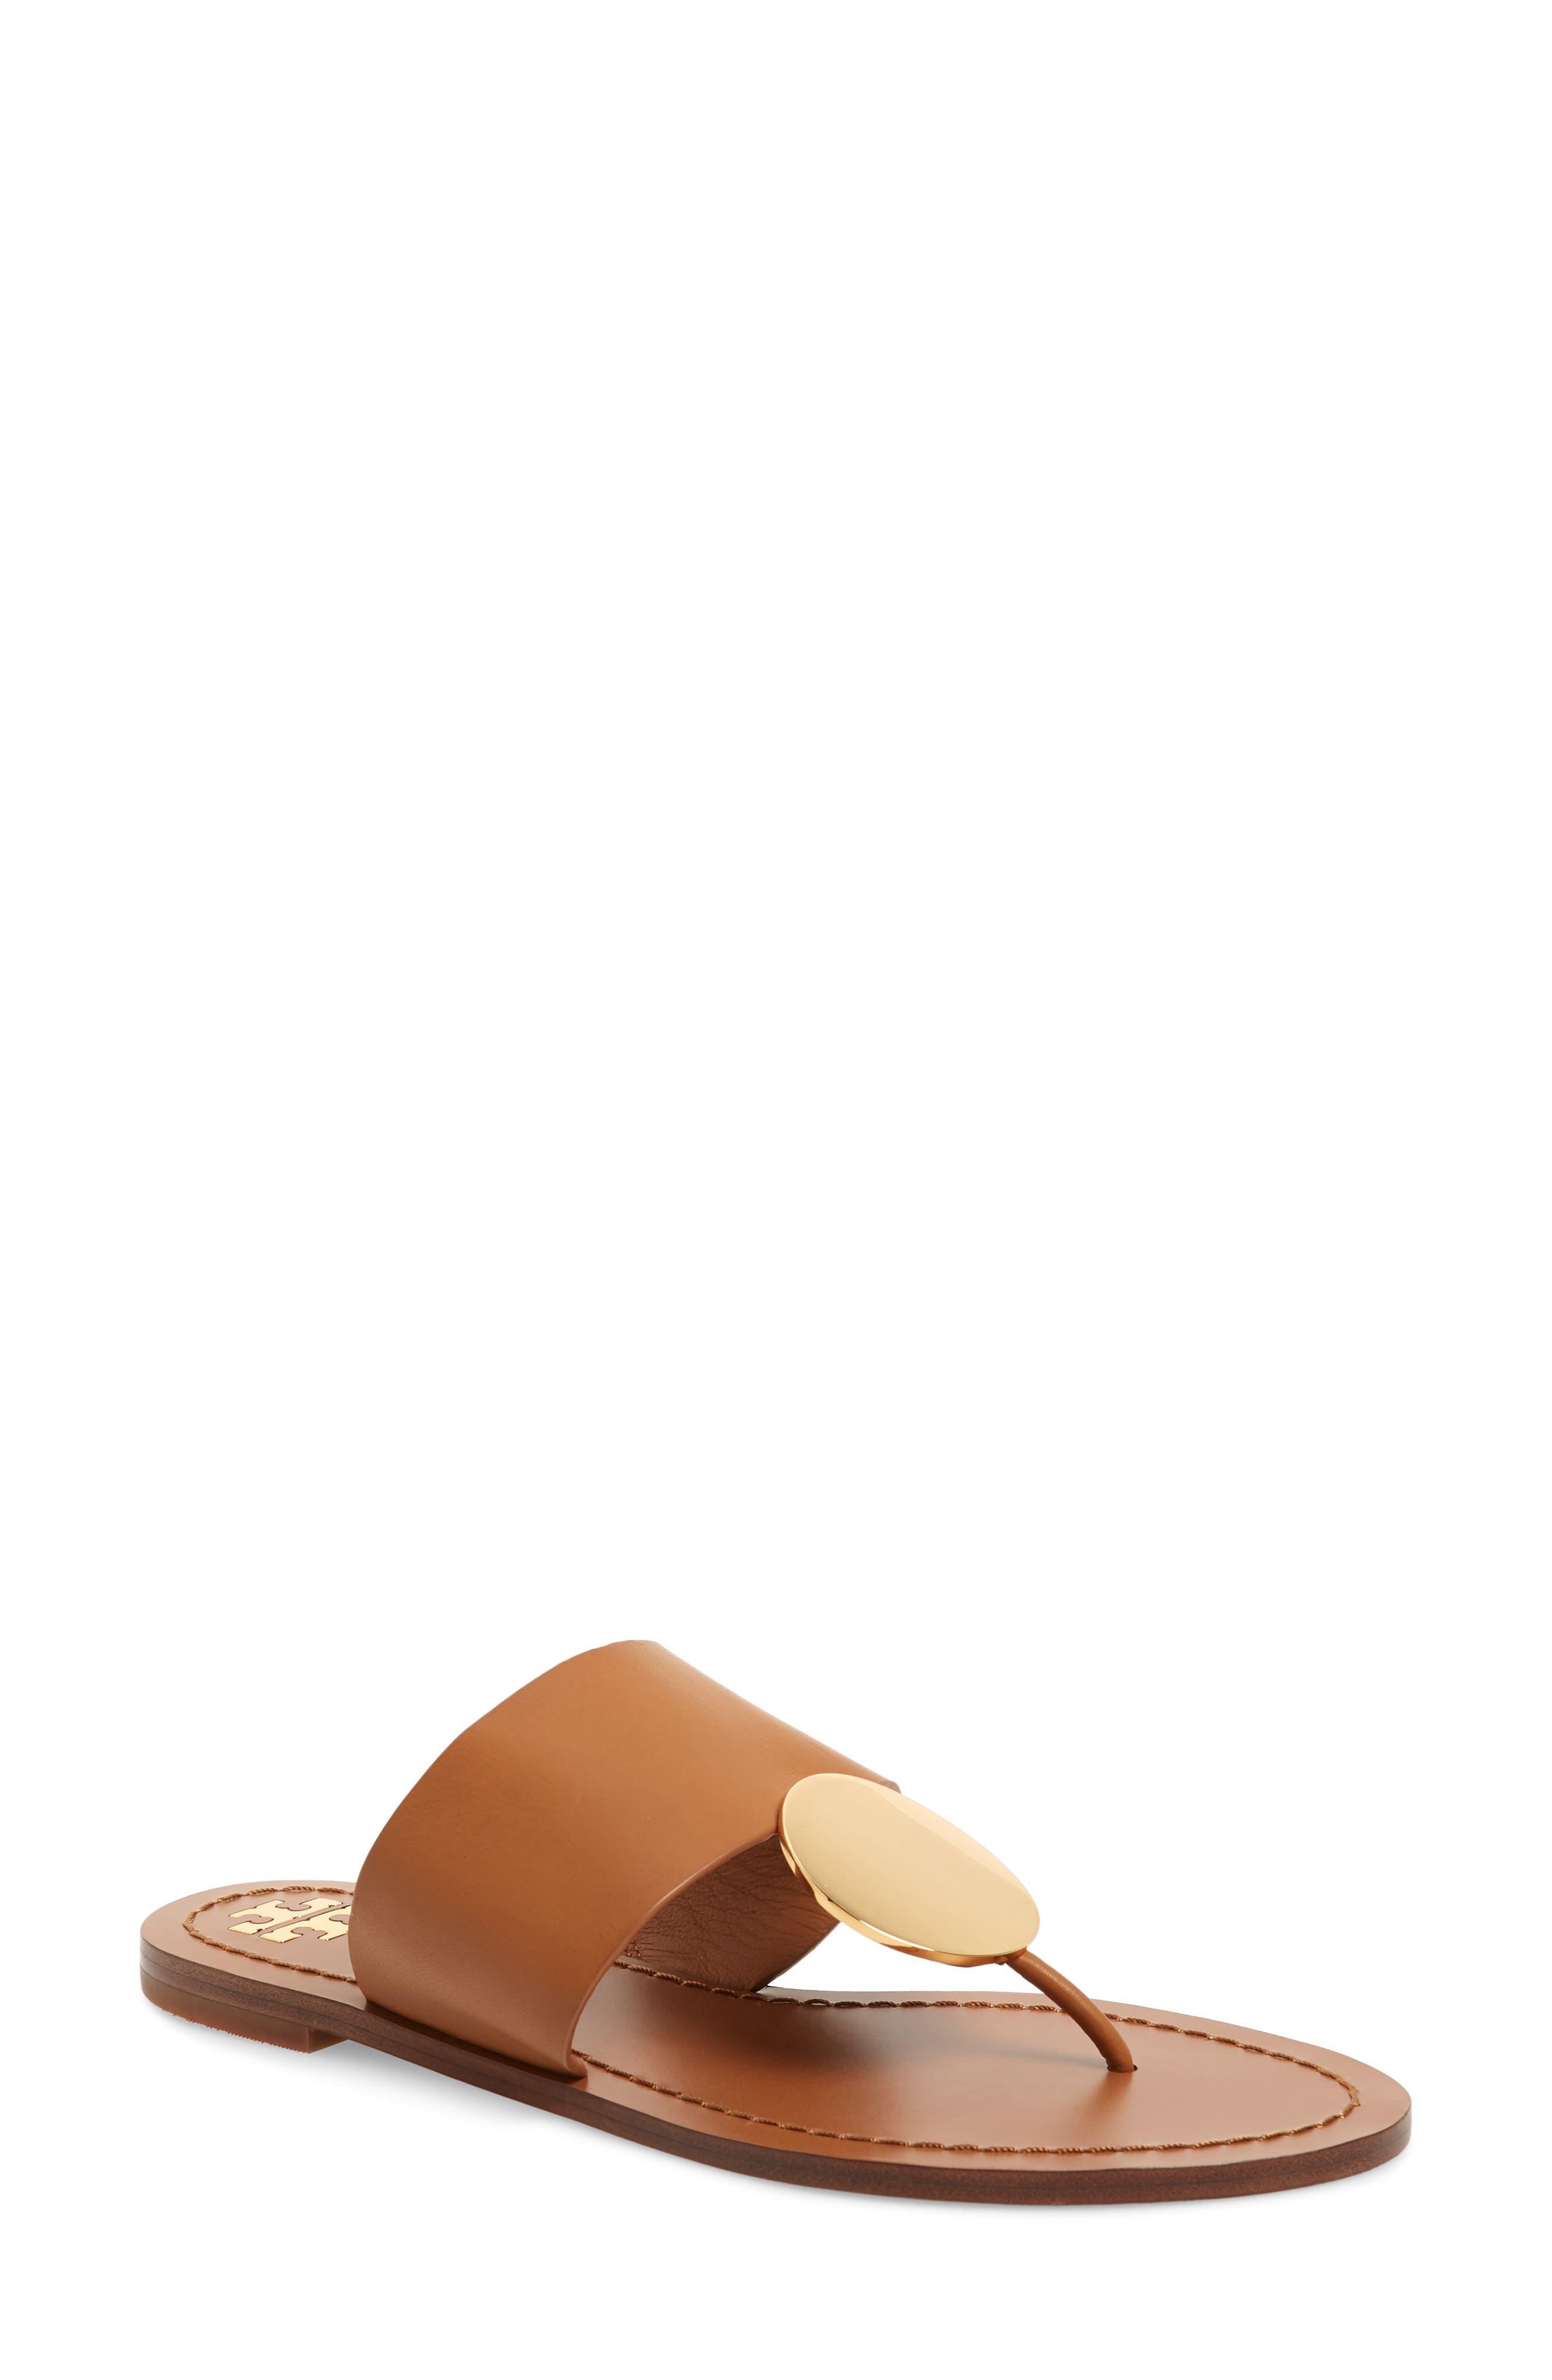 Tory Burch Patos Sandal, Brown